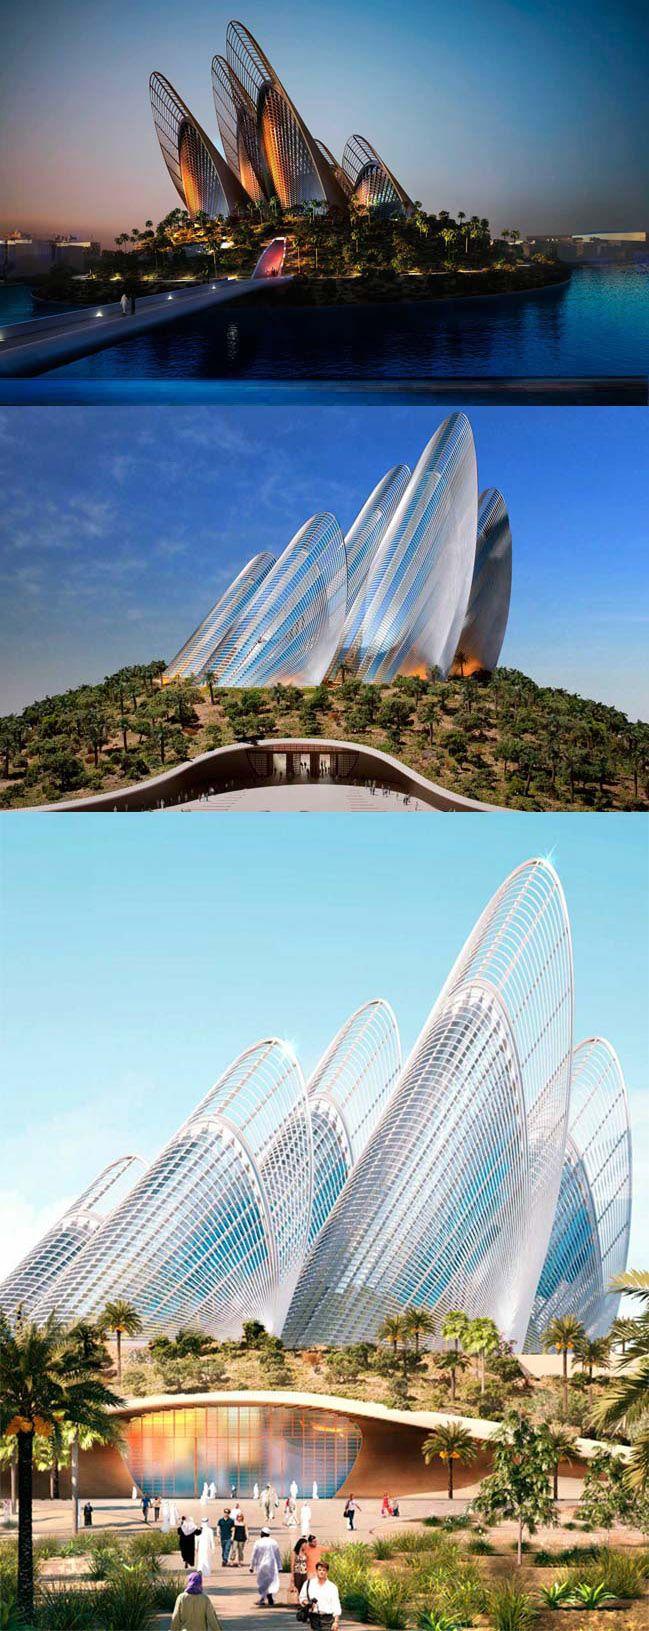 Best 20+ Futuristic architecture ideas on Pinterest